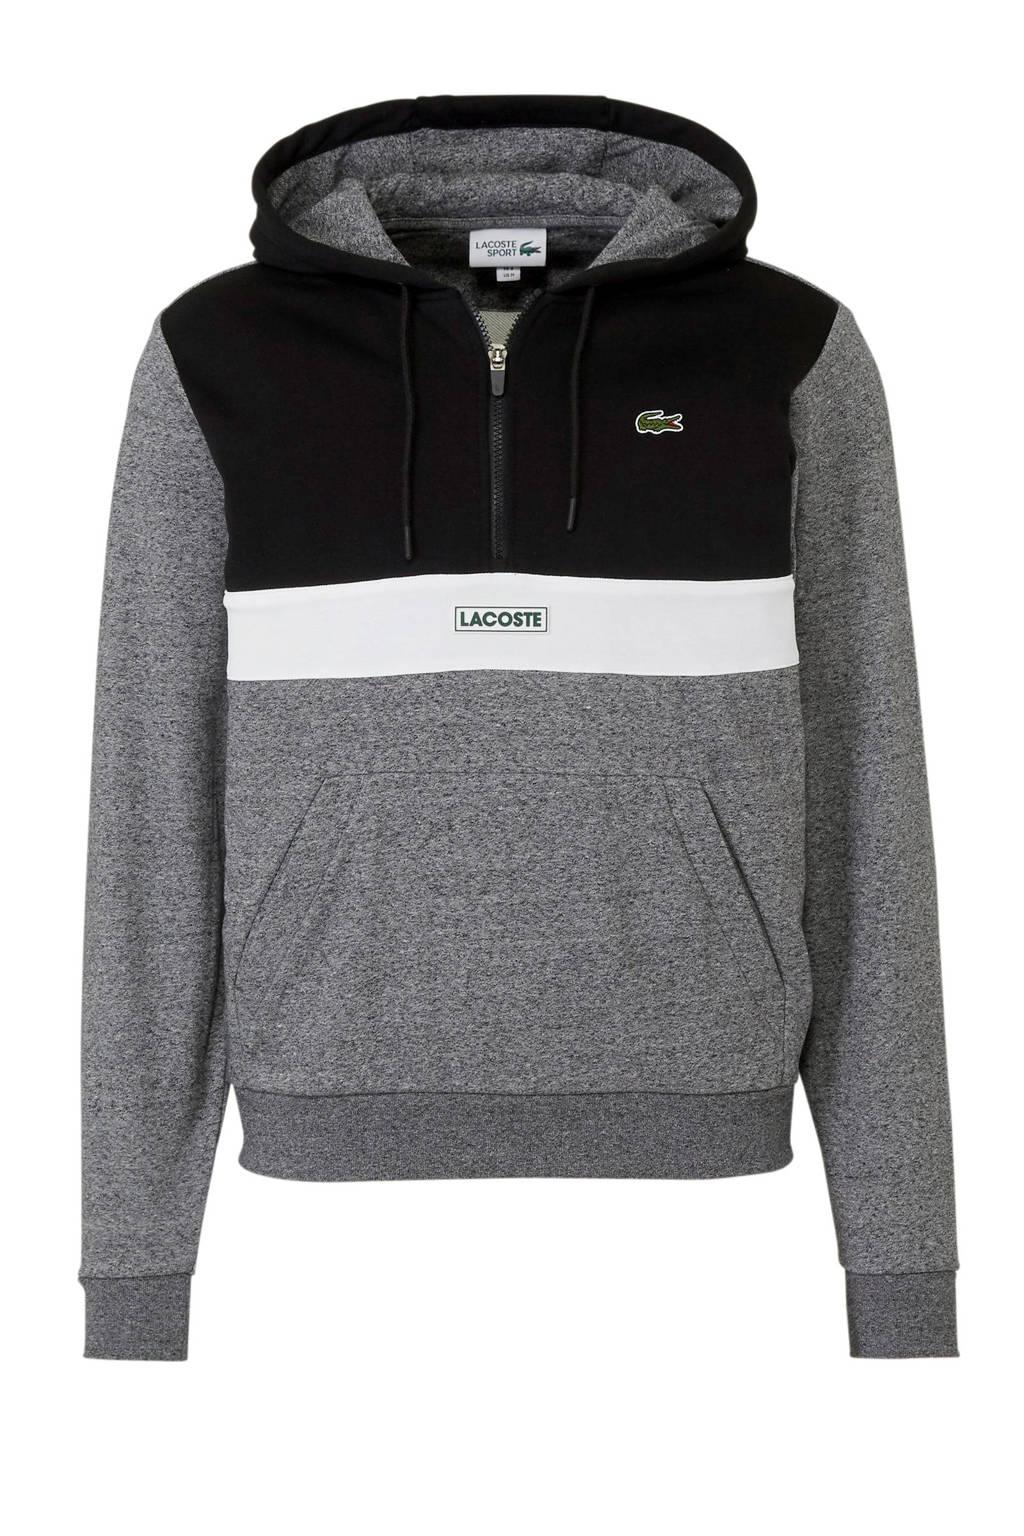 Lacoste   hoody, Zwart/grijs/wit